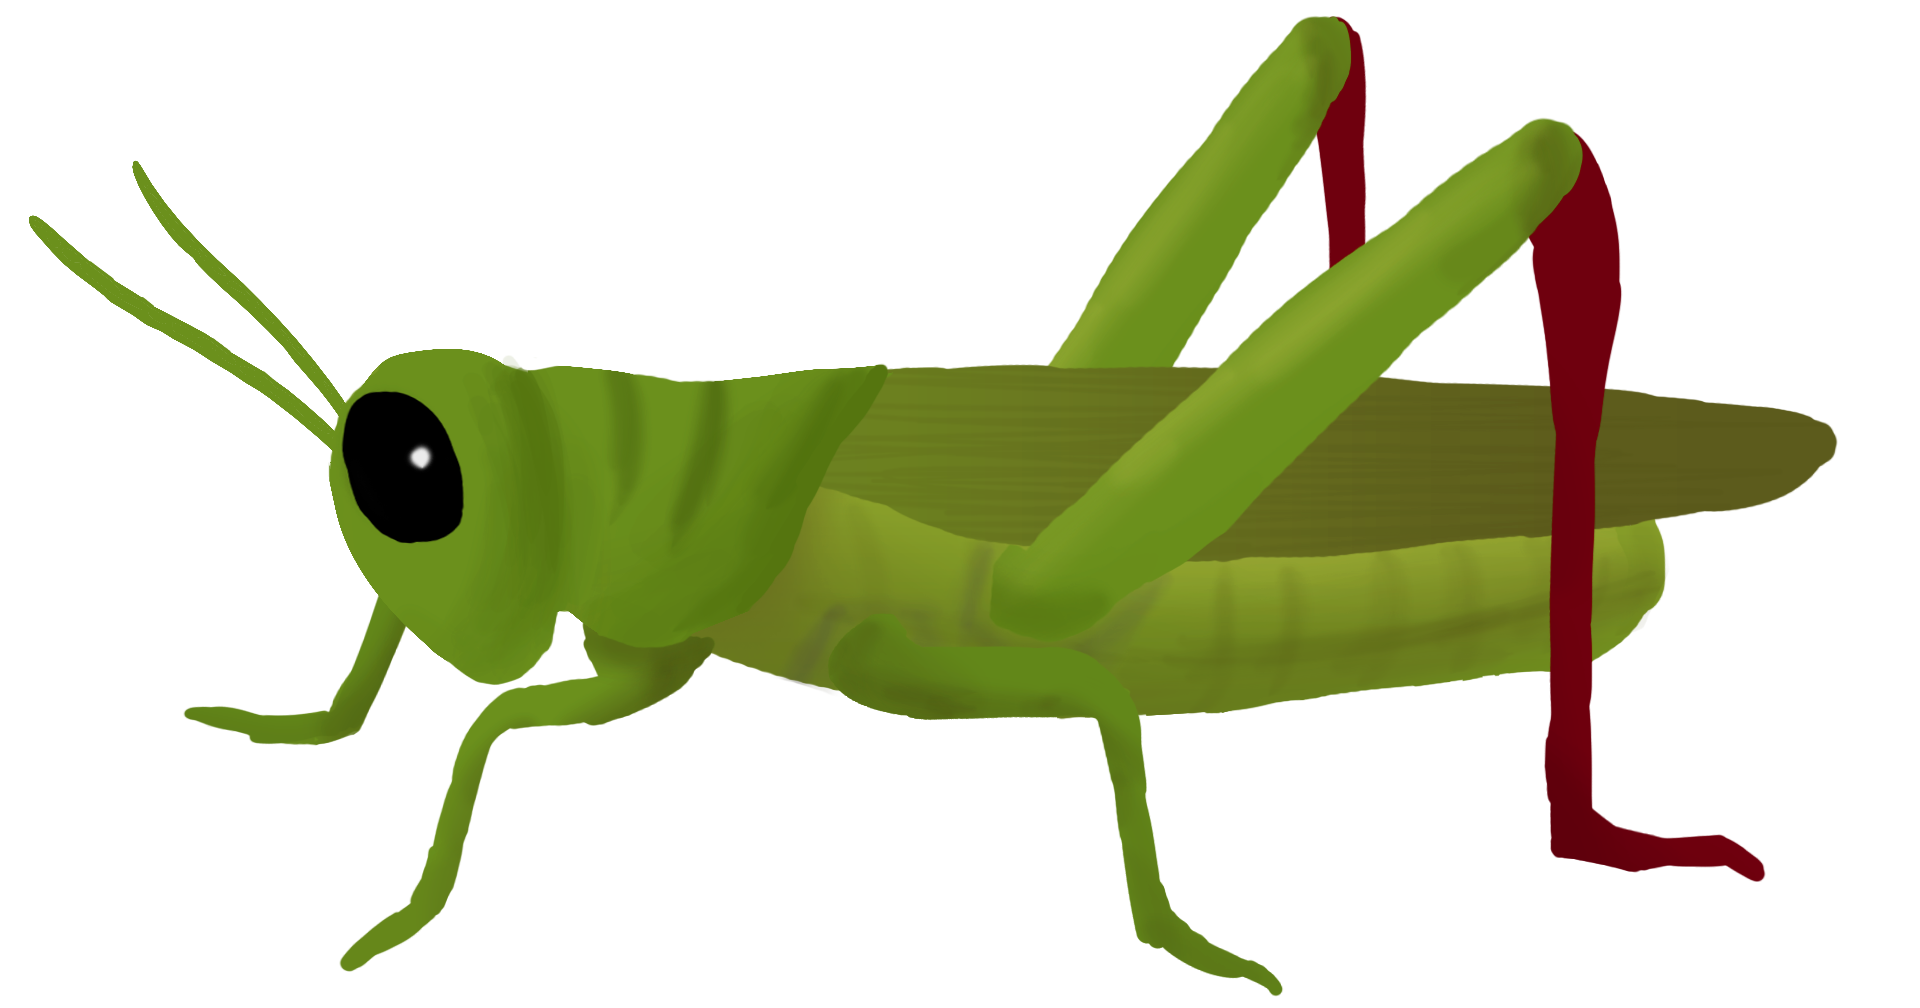 1920x1008 Grasshopper Clipart Png Amp Grasshopper Clip Art Png Images